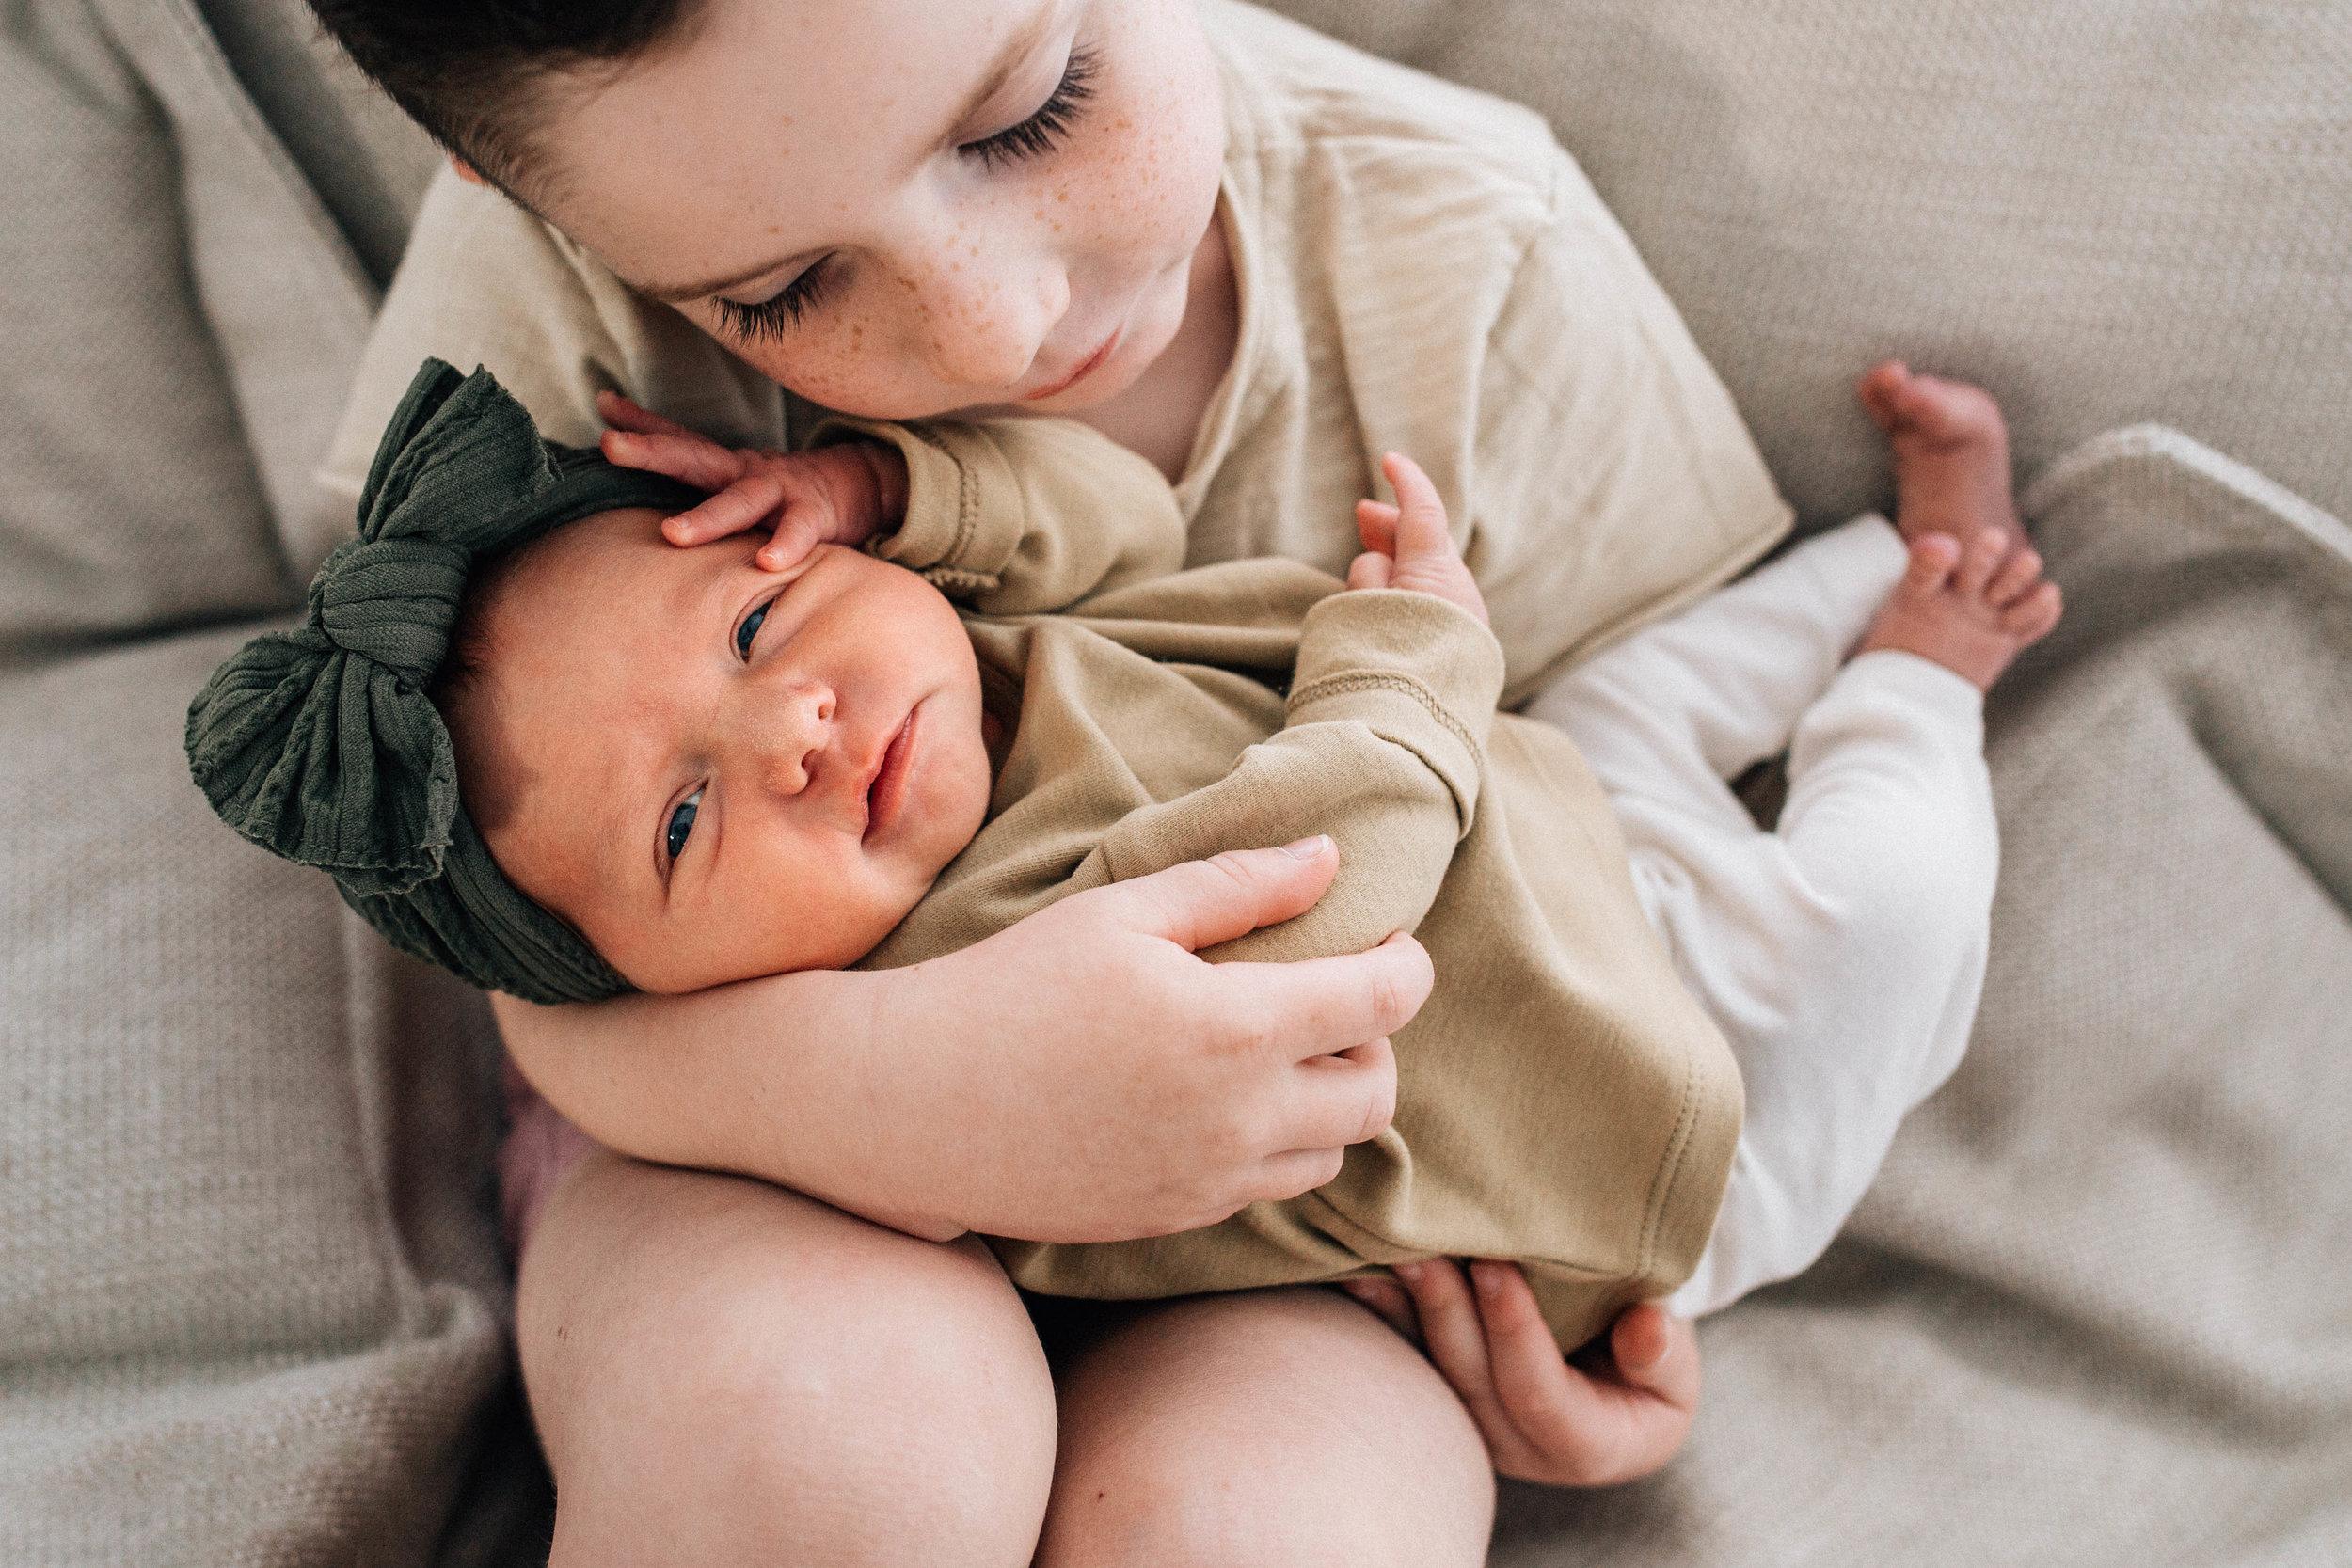 brother-and-newborn-sister.jpg